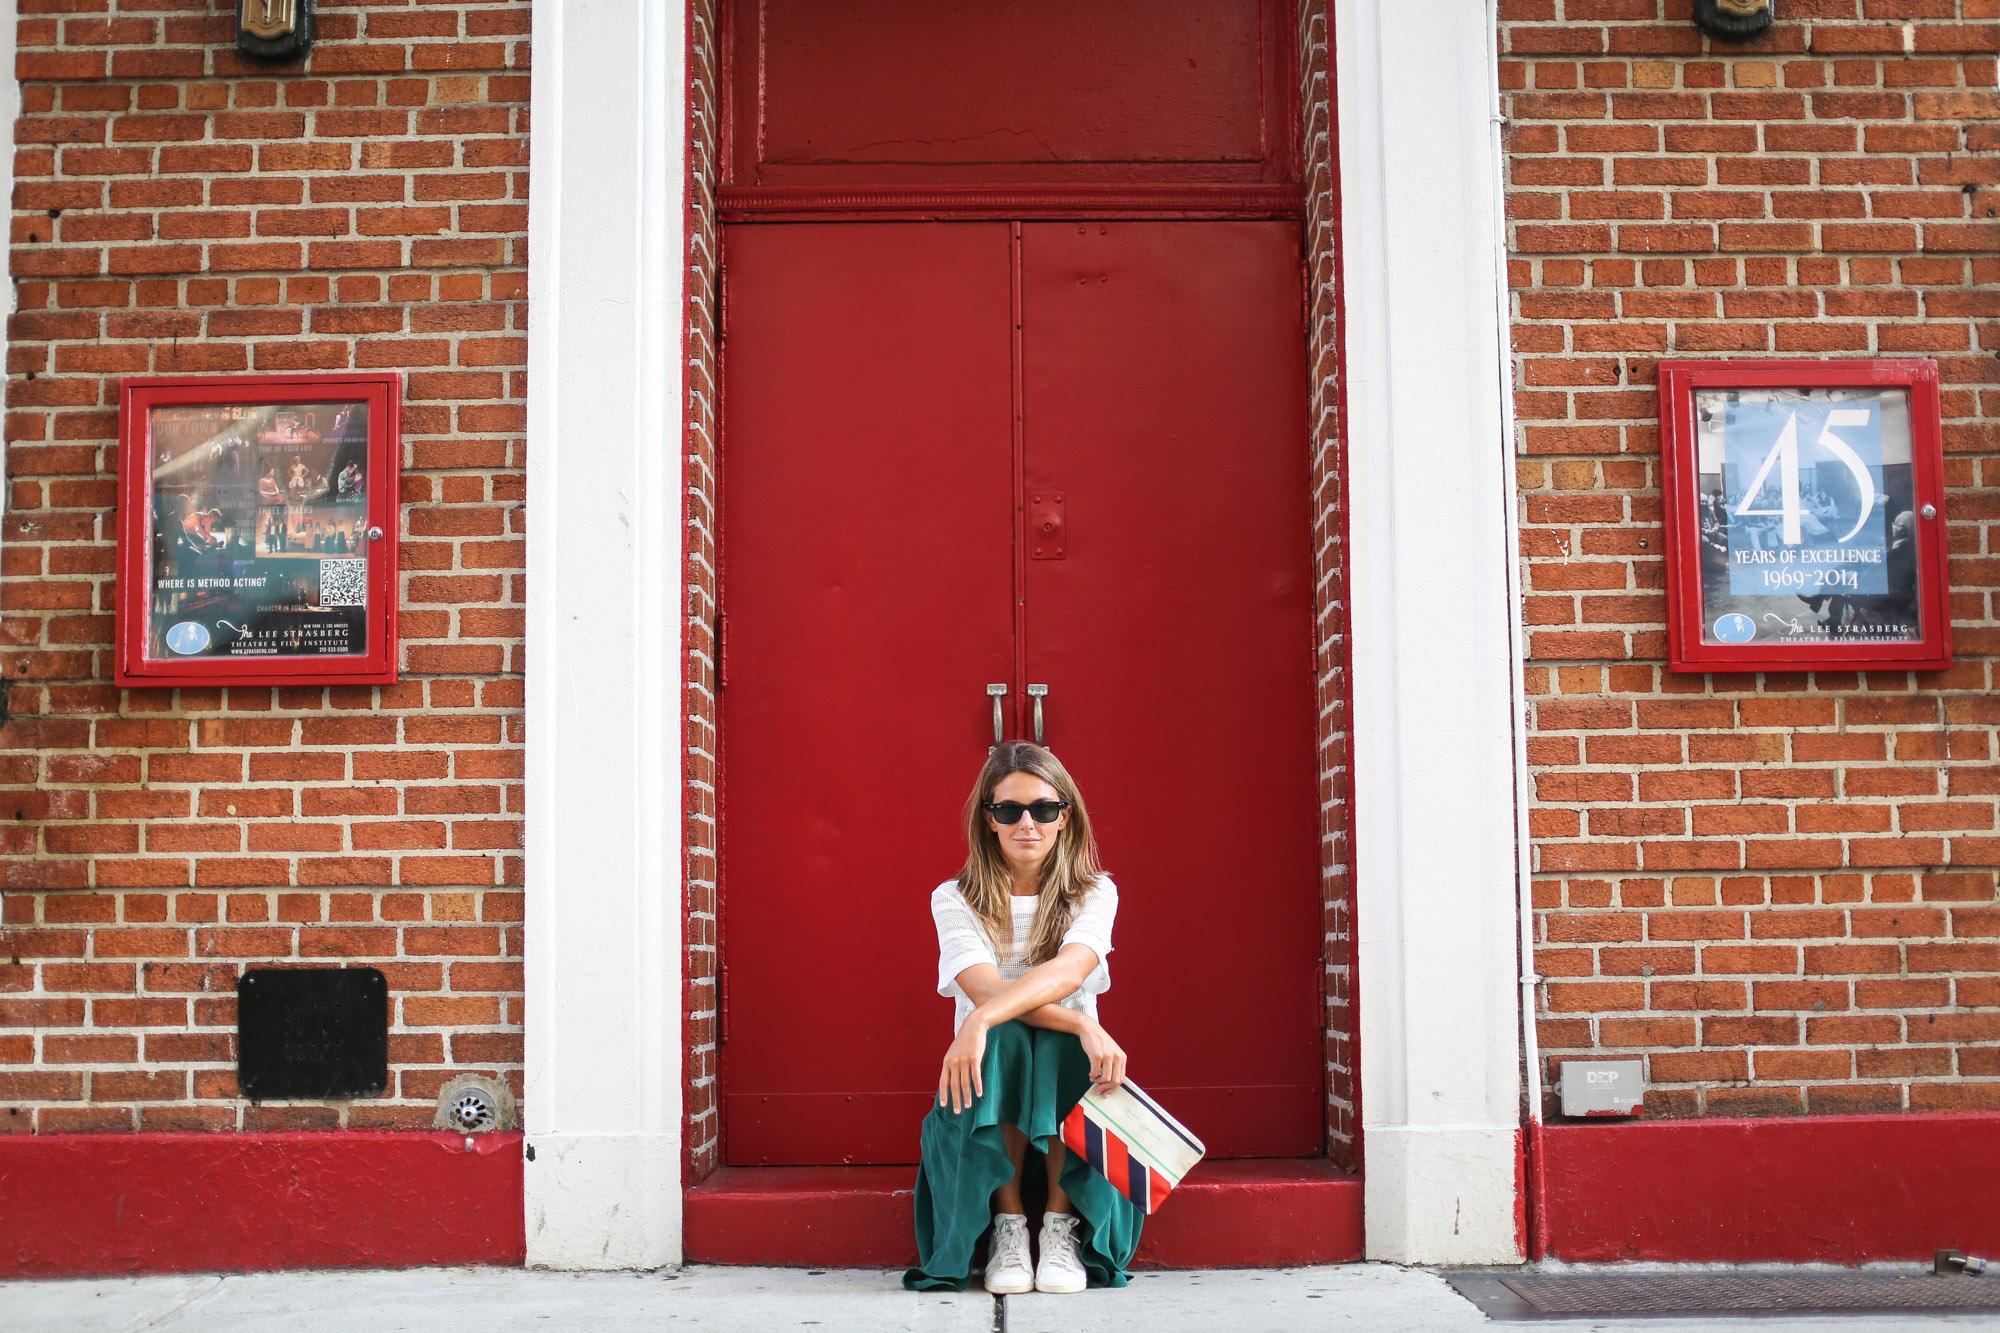 Clochet_streetstyle_newyork_h&m_trend_green_midi_skirt_adidas_stansmith-4